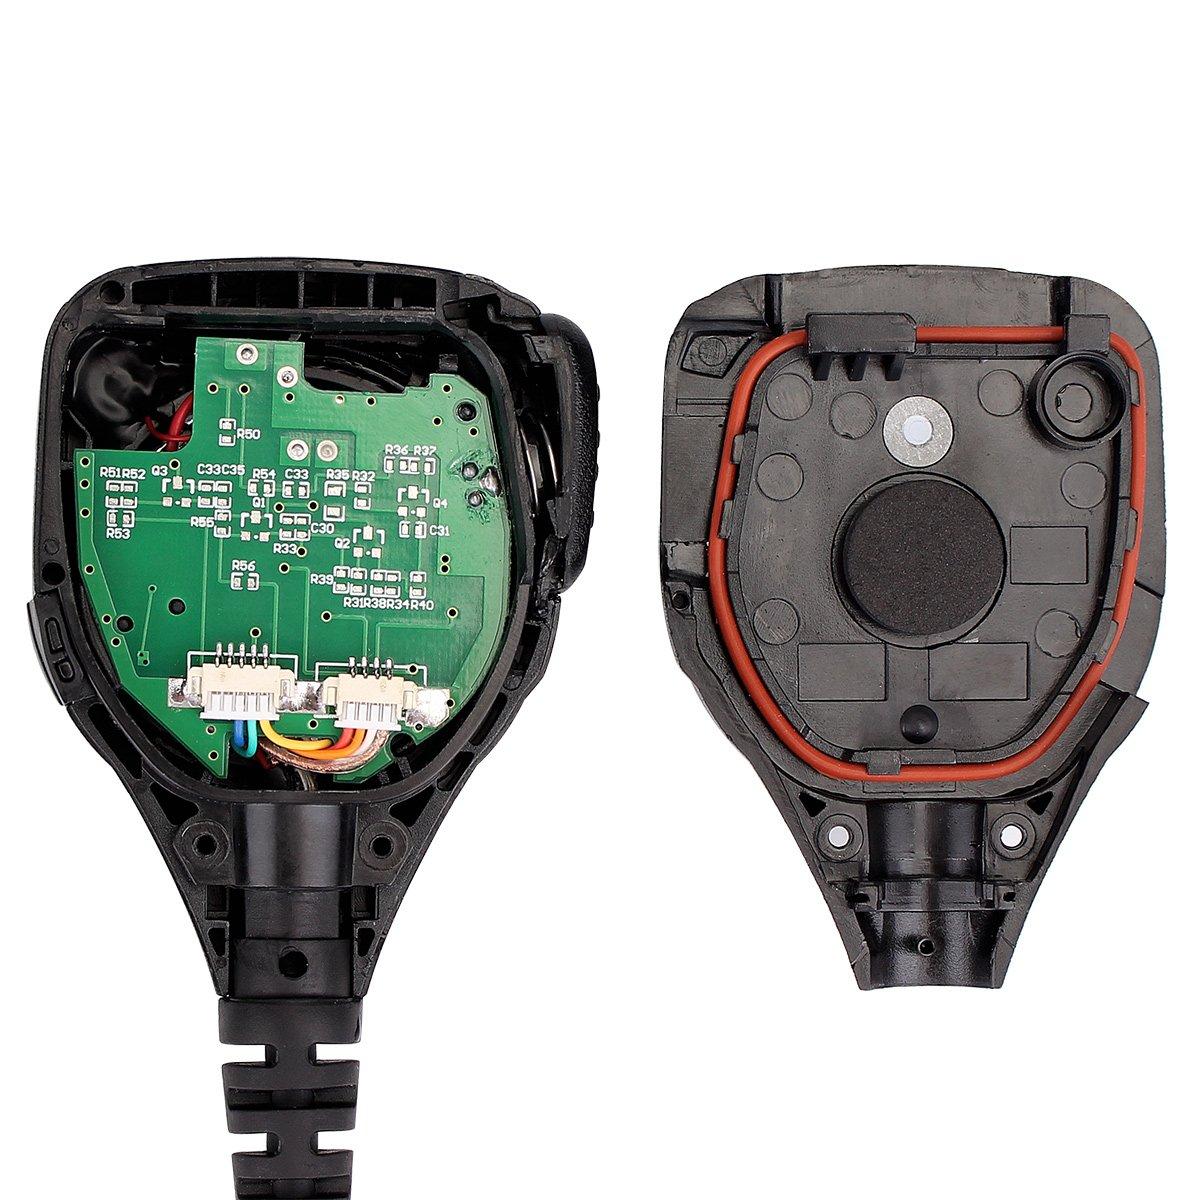 Amazon.com: Retevis 2 Pin Walkie Talkie Speaker Mic IP54 Waterproof Remote Speaker Microphone Fit Baofeng UV-5R BF-888S BF-F8HP Retevis RT-5R H-777S H-777 ...